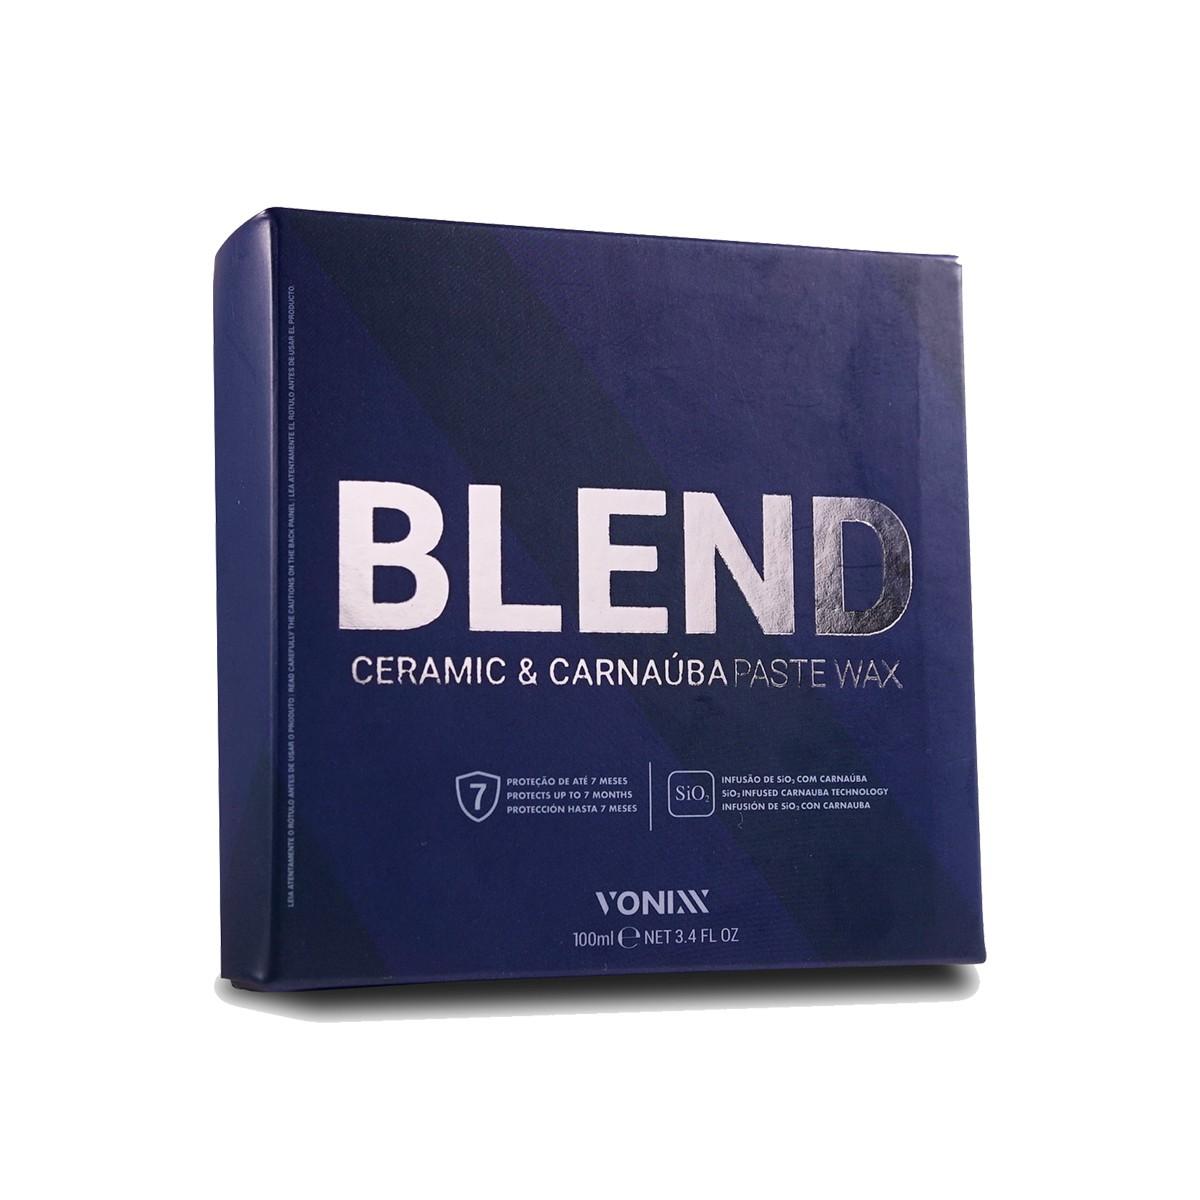 Blend Ceramic & Carnaúba Paste Wax ( Cera em Pasta com SI02 & Carnaúba) - Vonixx